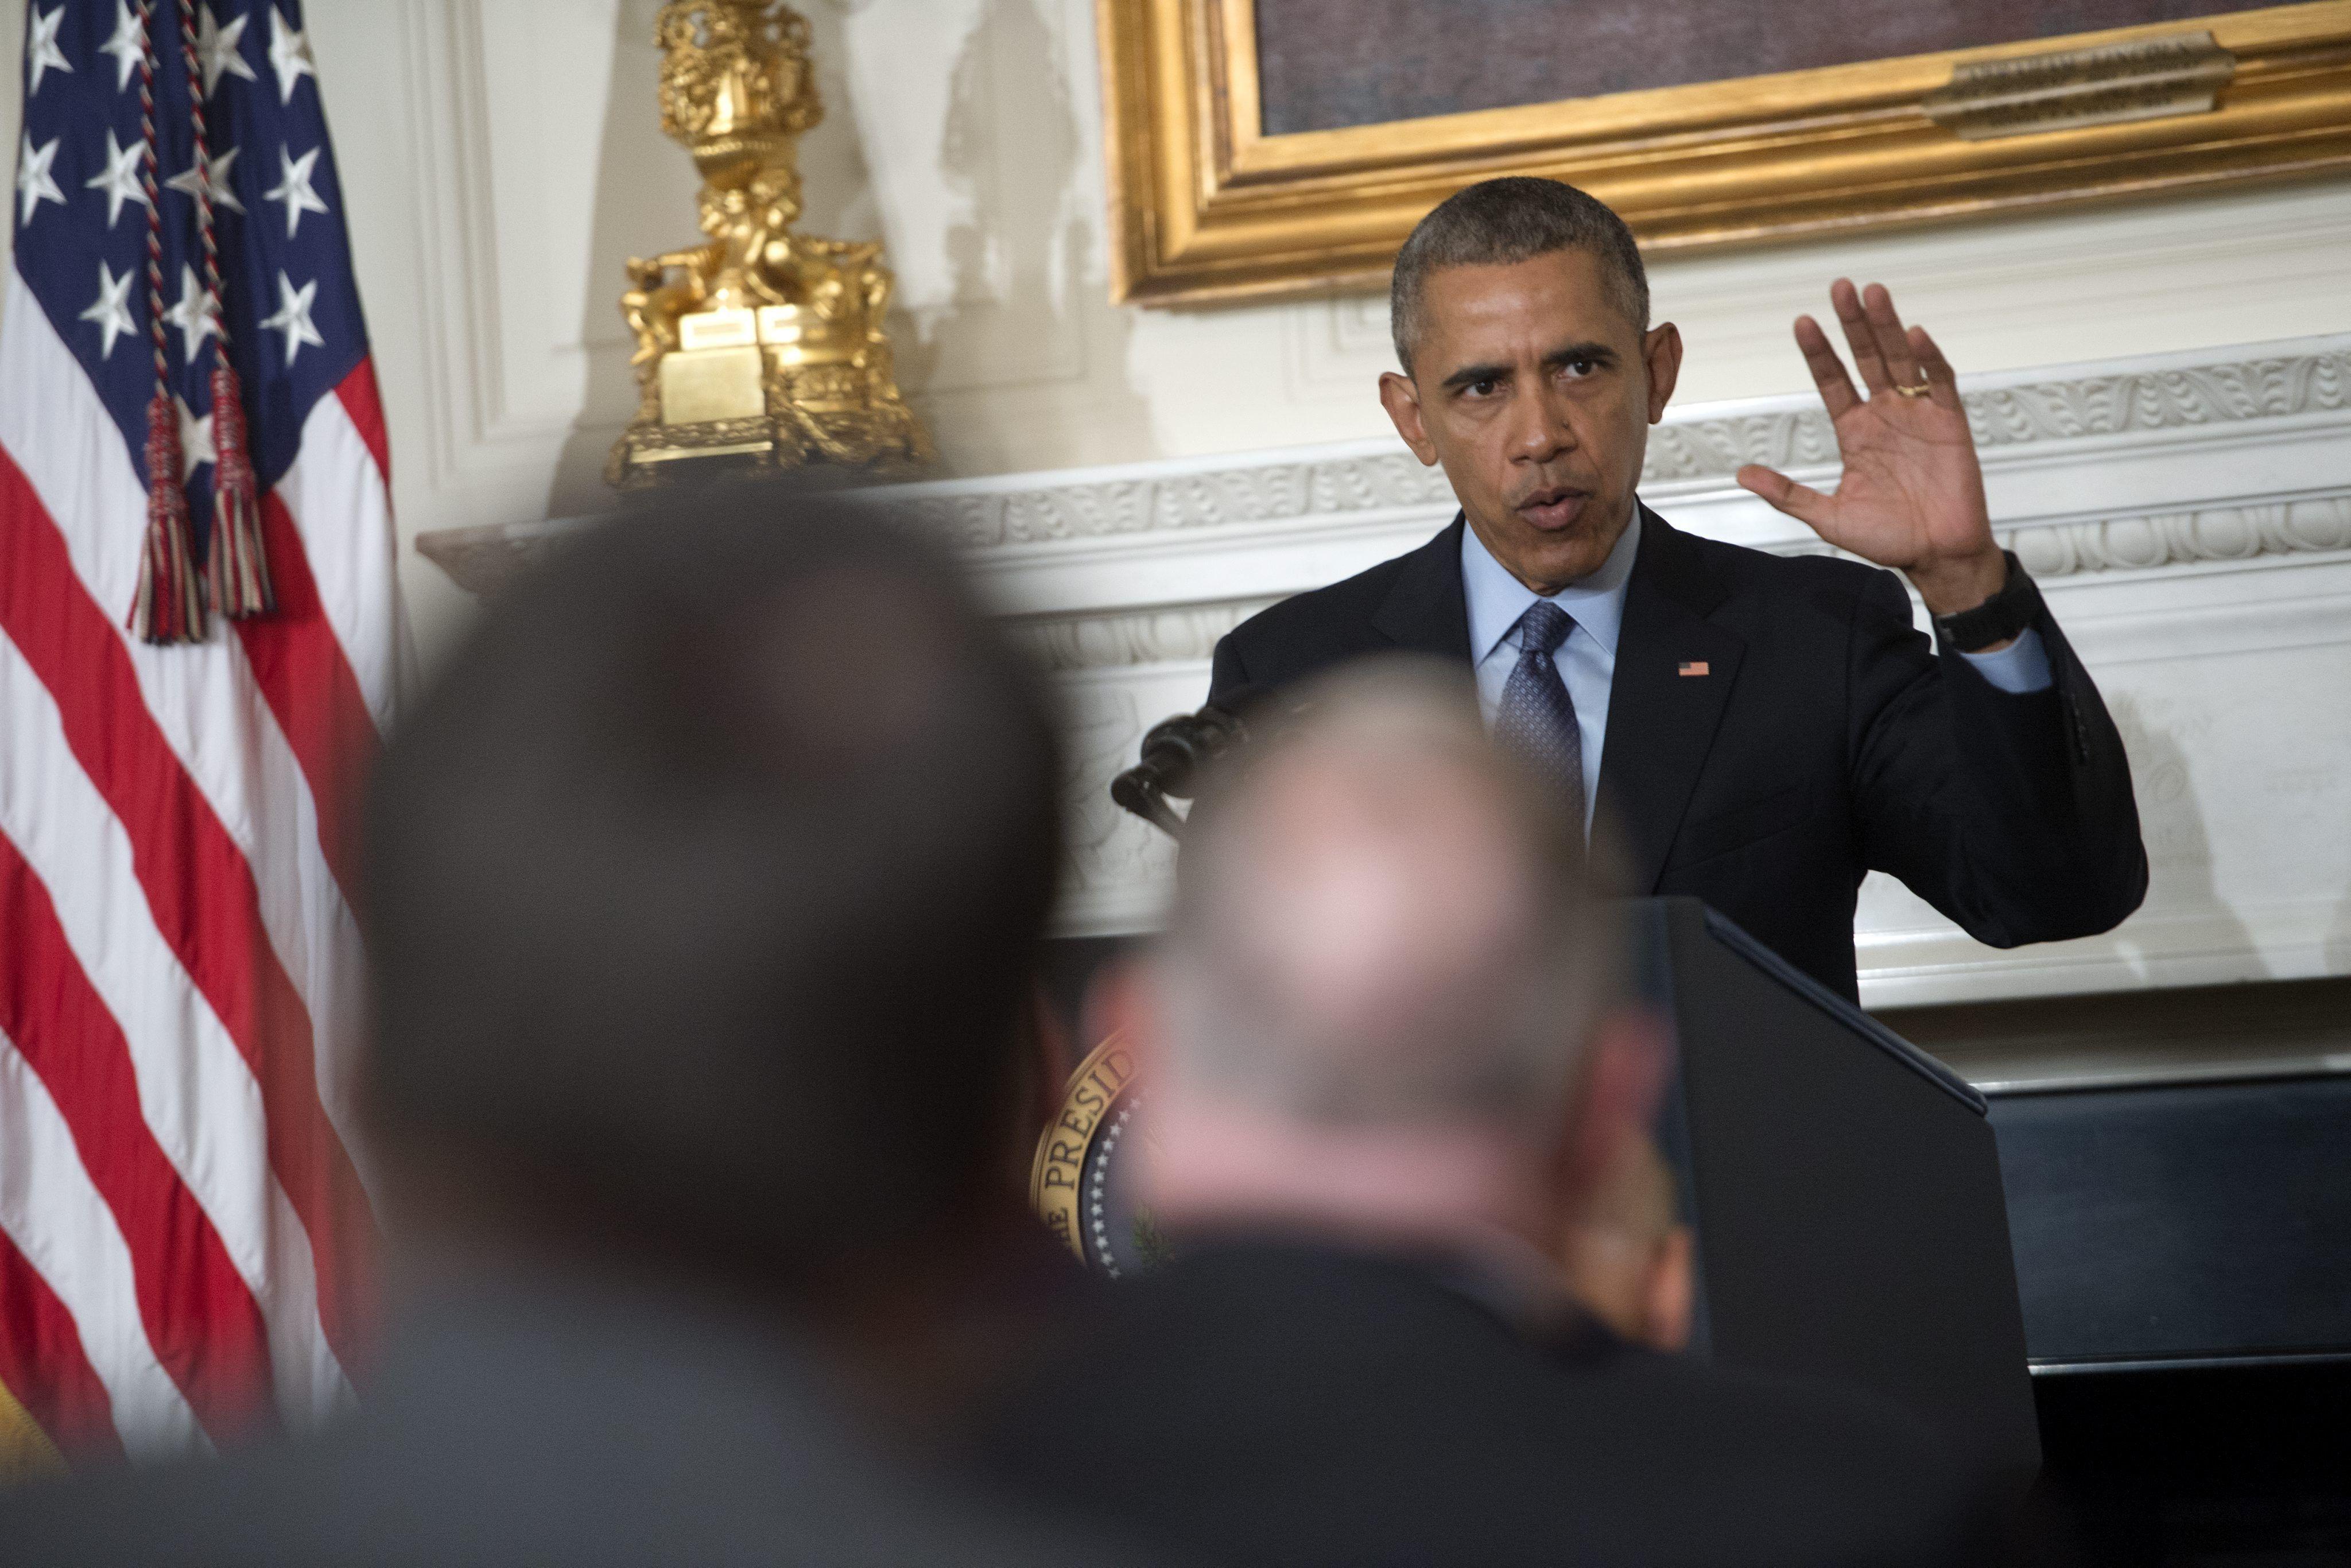 Obama presentó un plan para cerrar la cárcel de Guantánamo